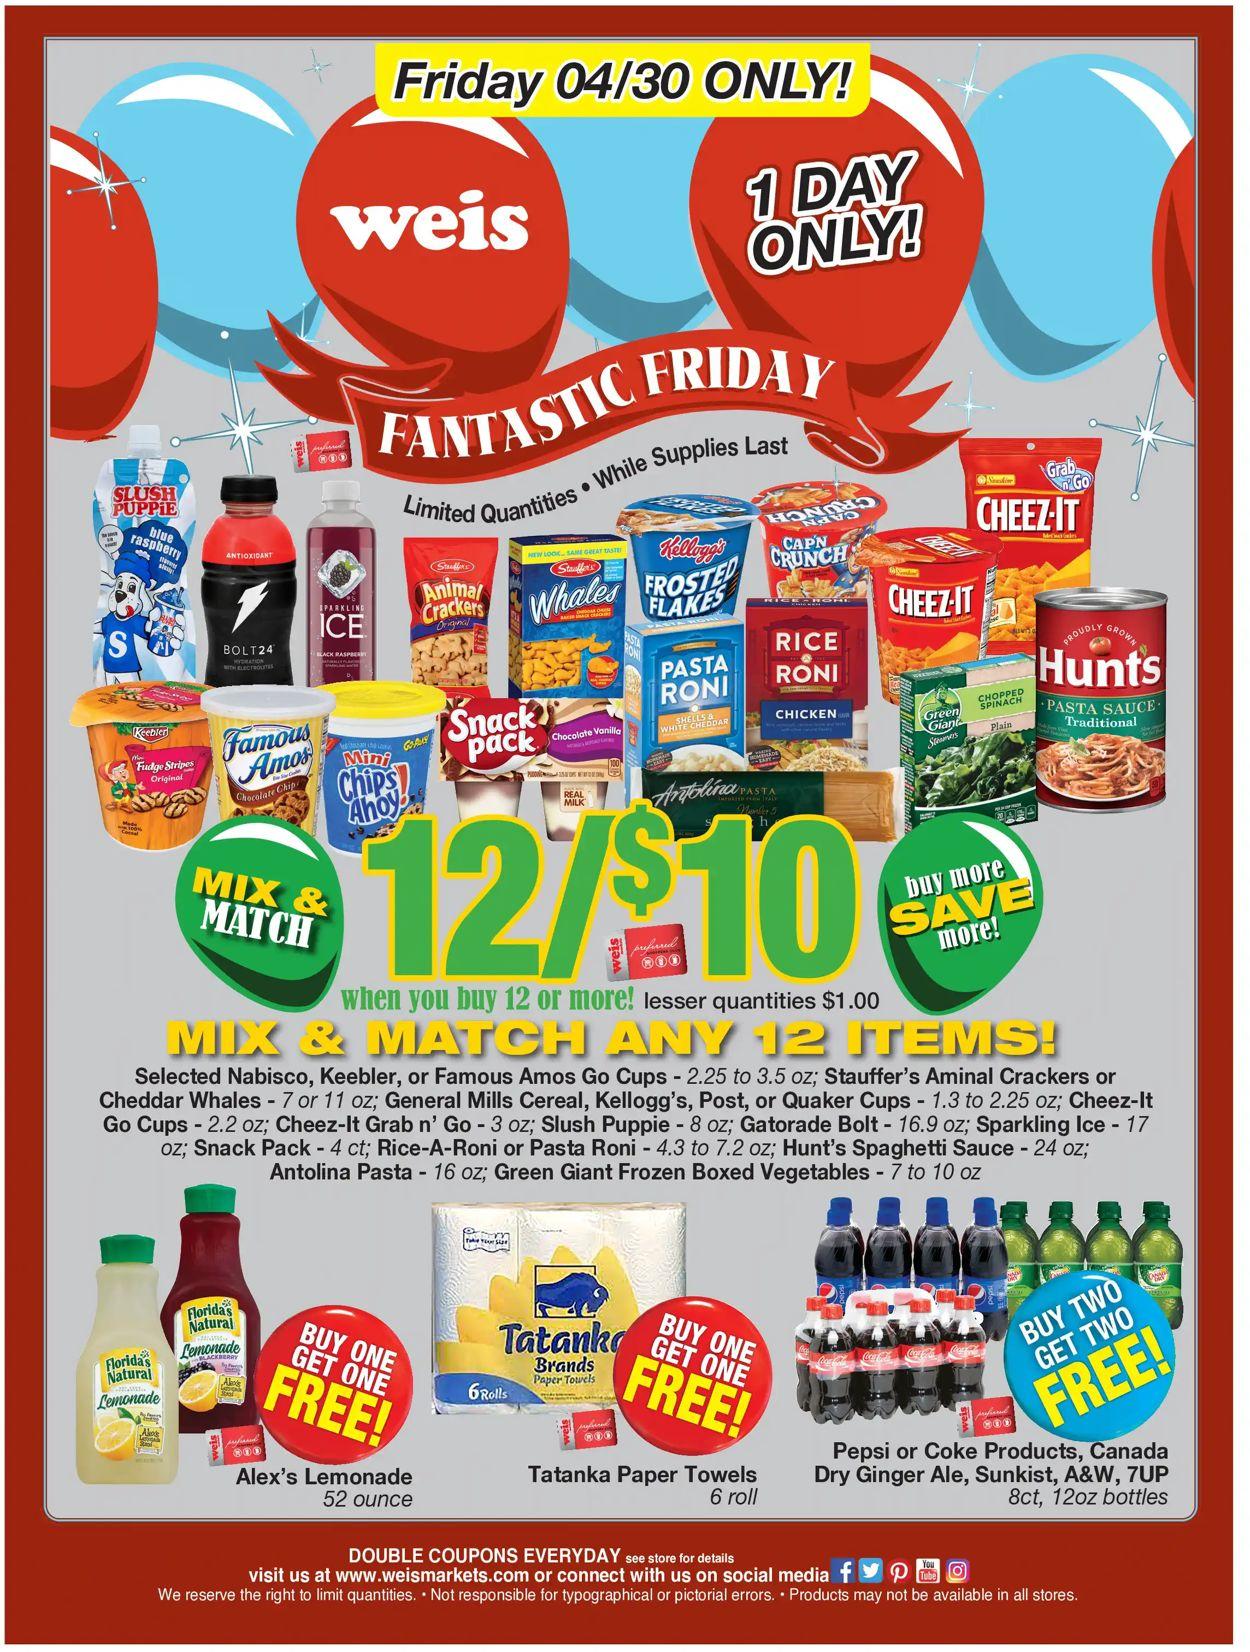 Weis Weekly Ad Circular - valid 04/30-04/30/2021